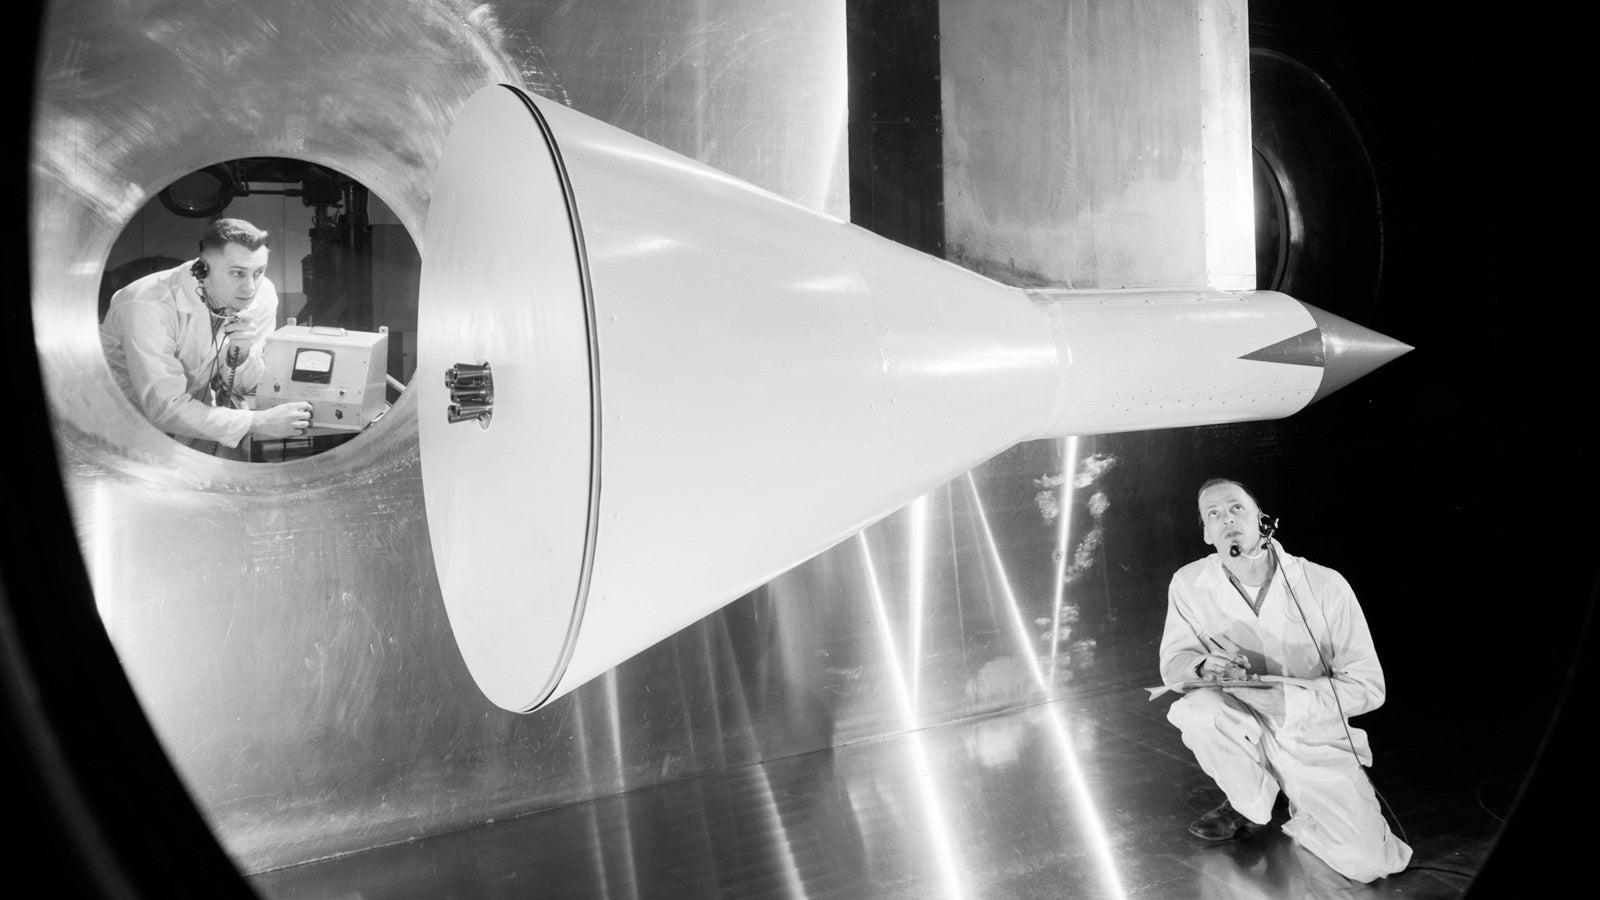 تونل باد مافوق صوت (۱)